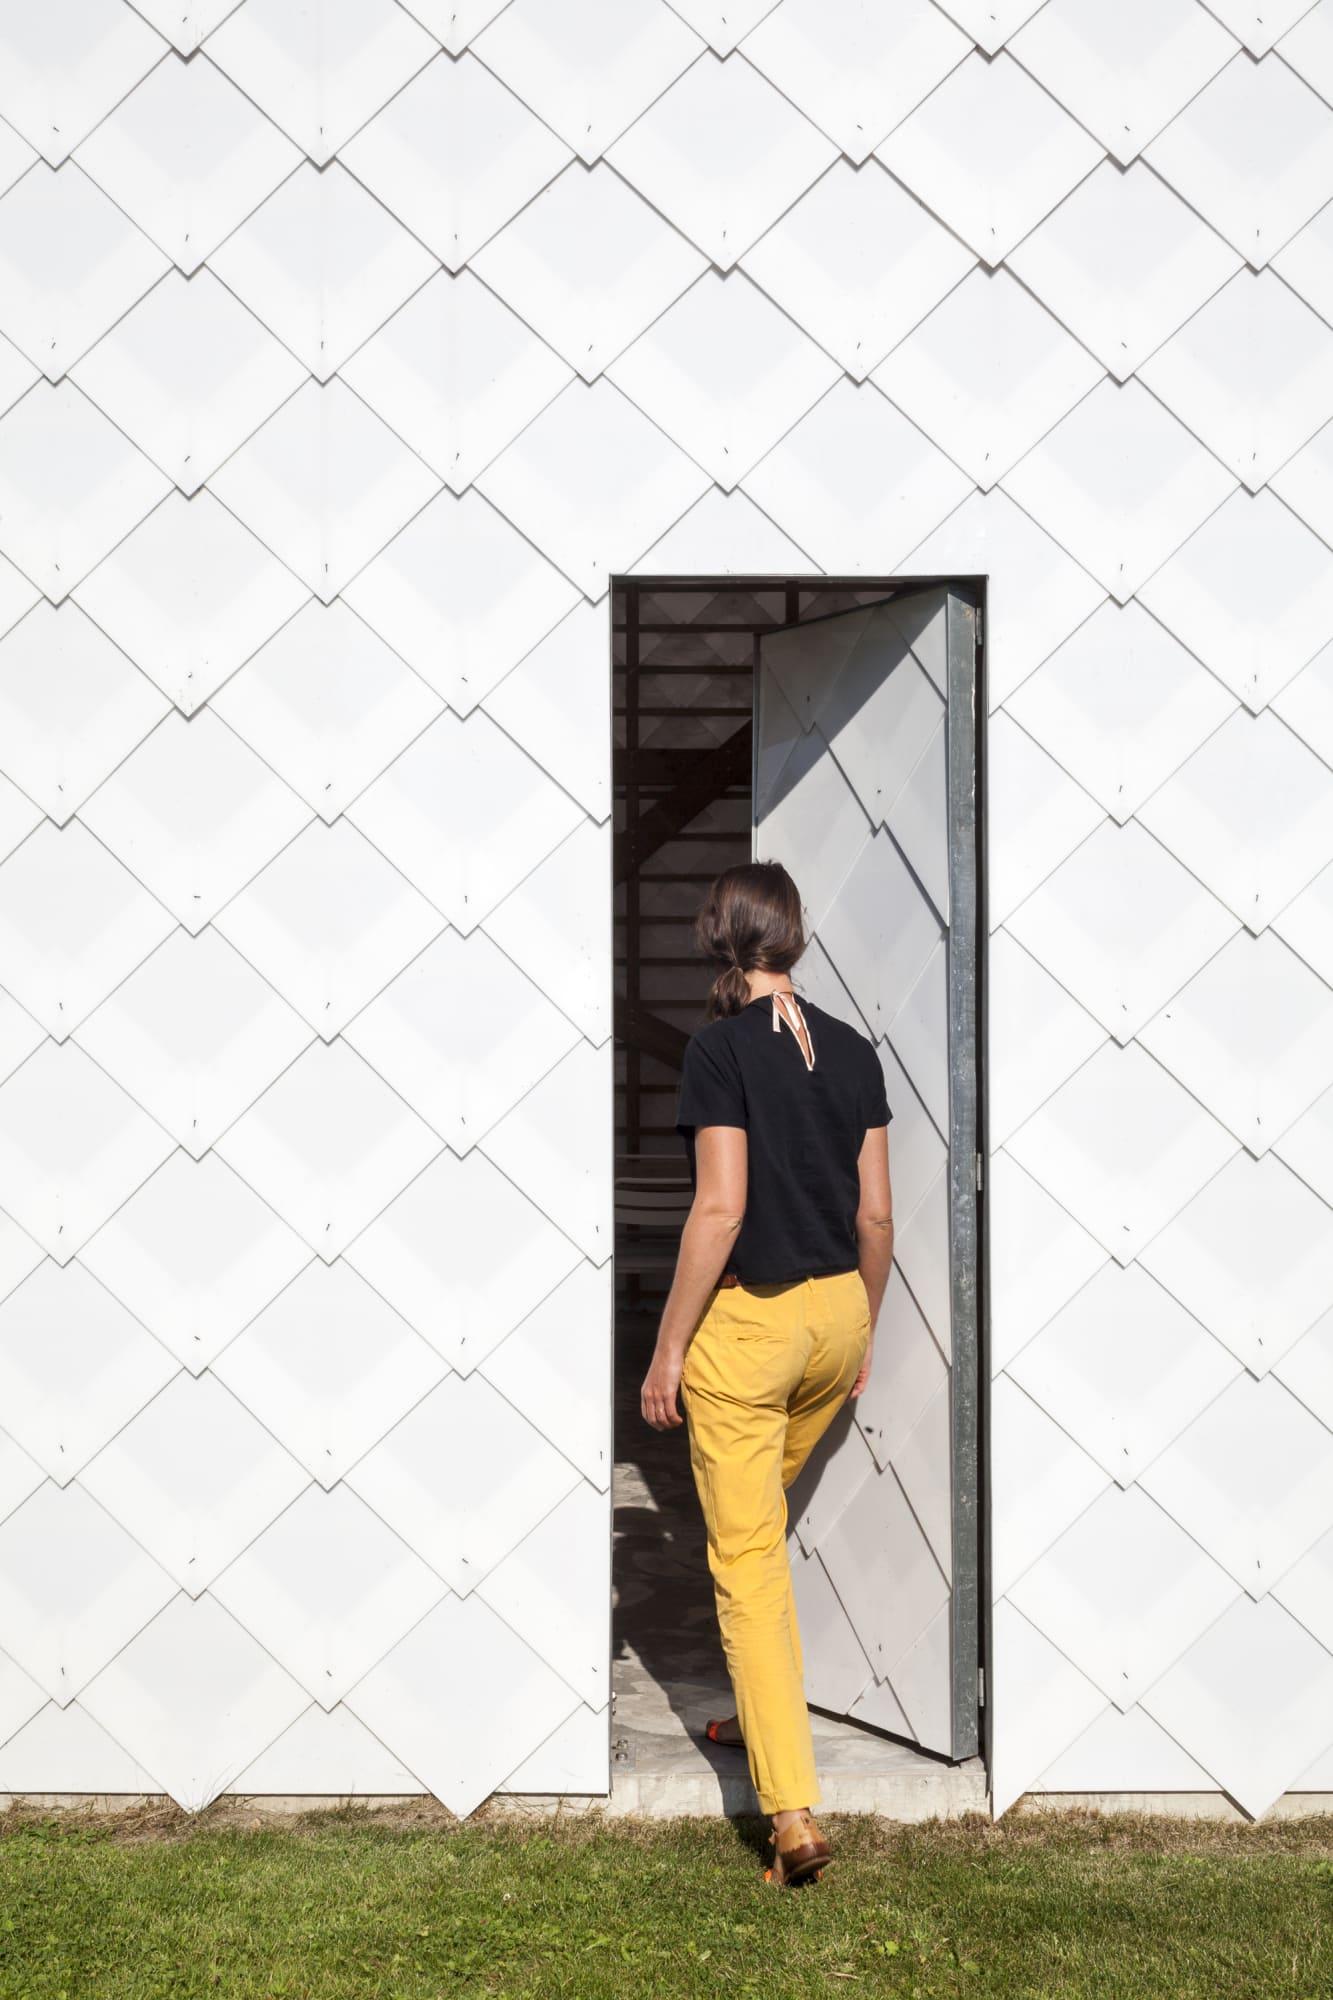 Atelier Janda Vanderghote Tim Van De Velde A Newly Drawn Courtyard Divisare